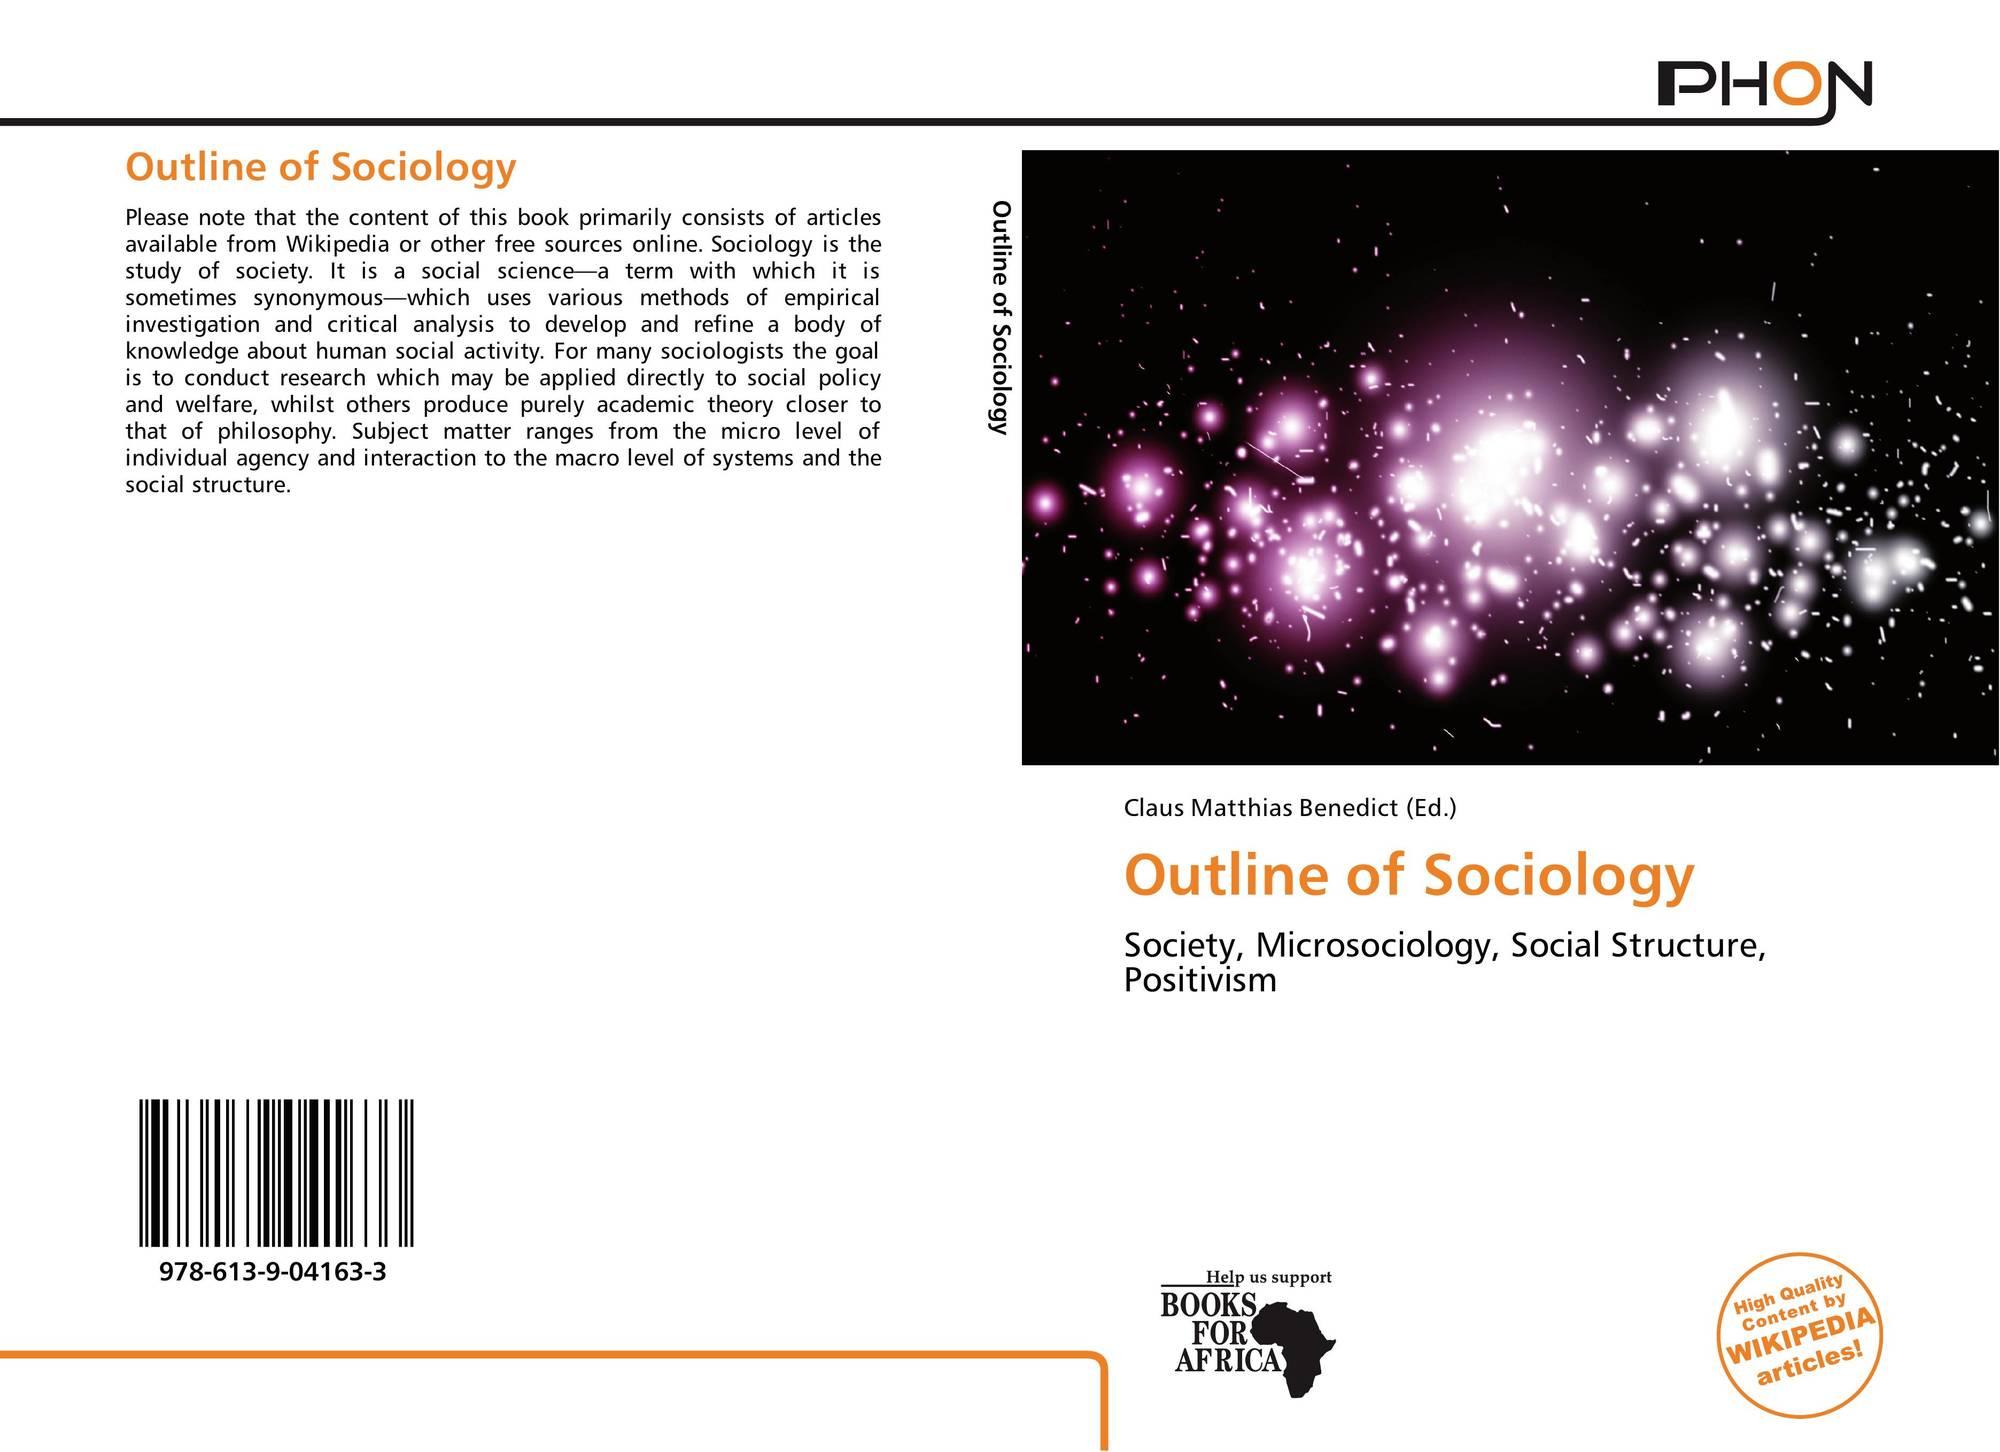 microsociology